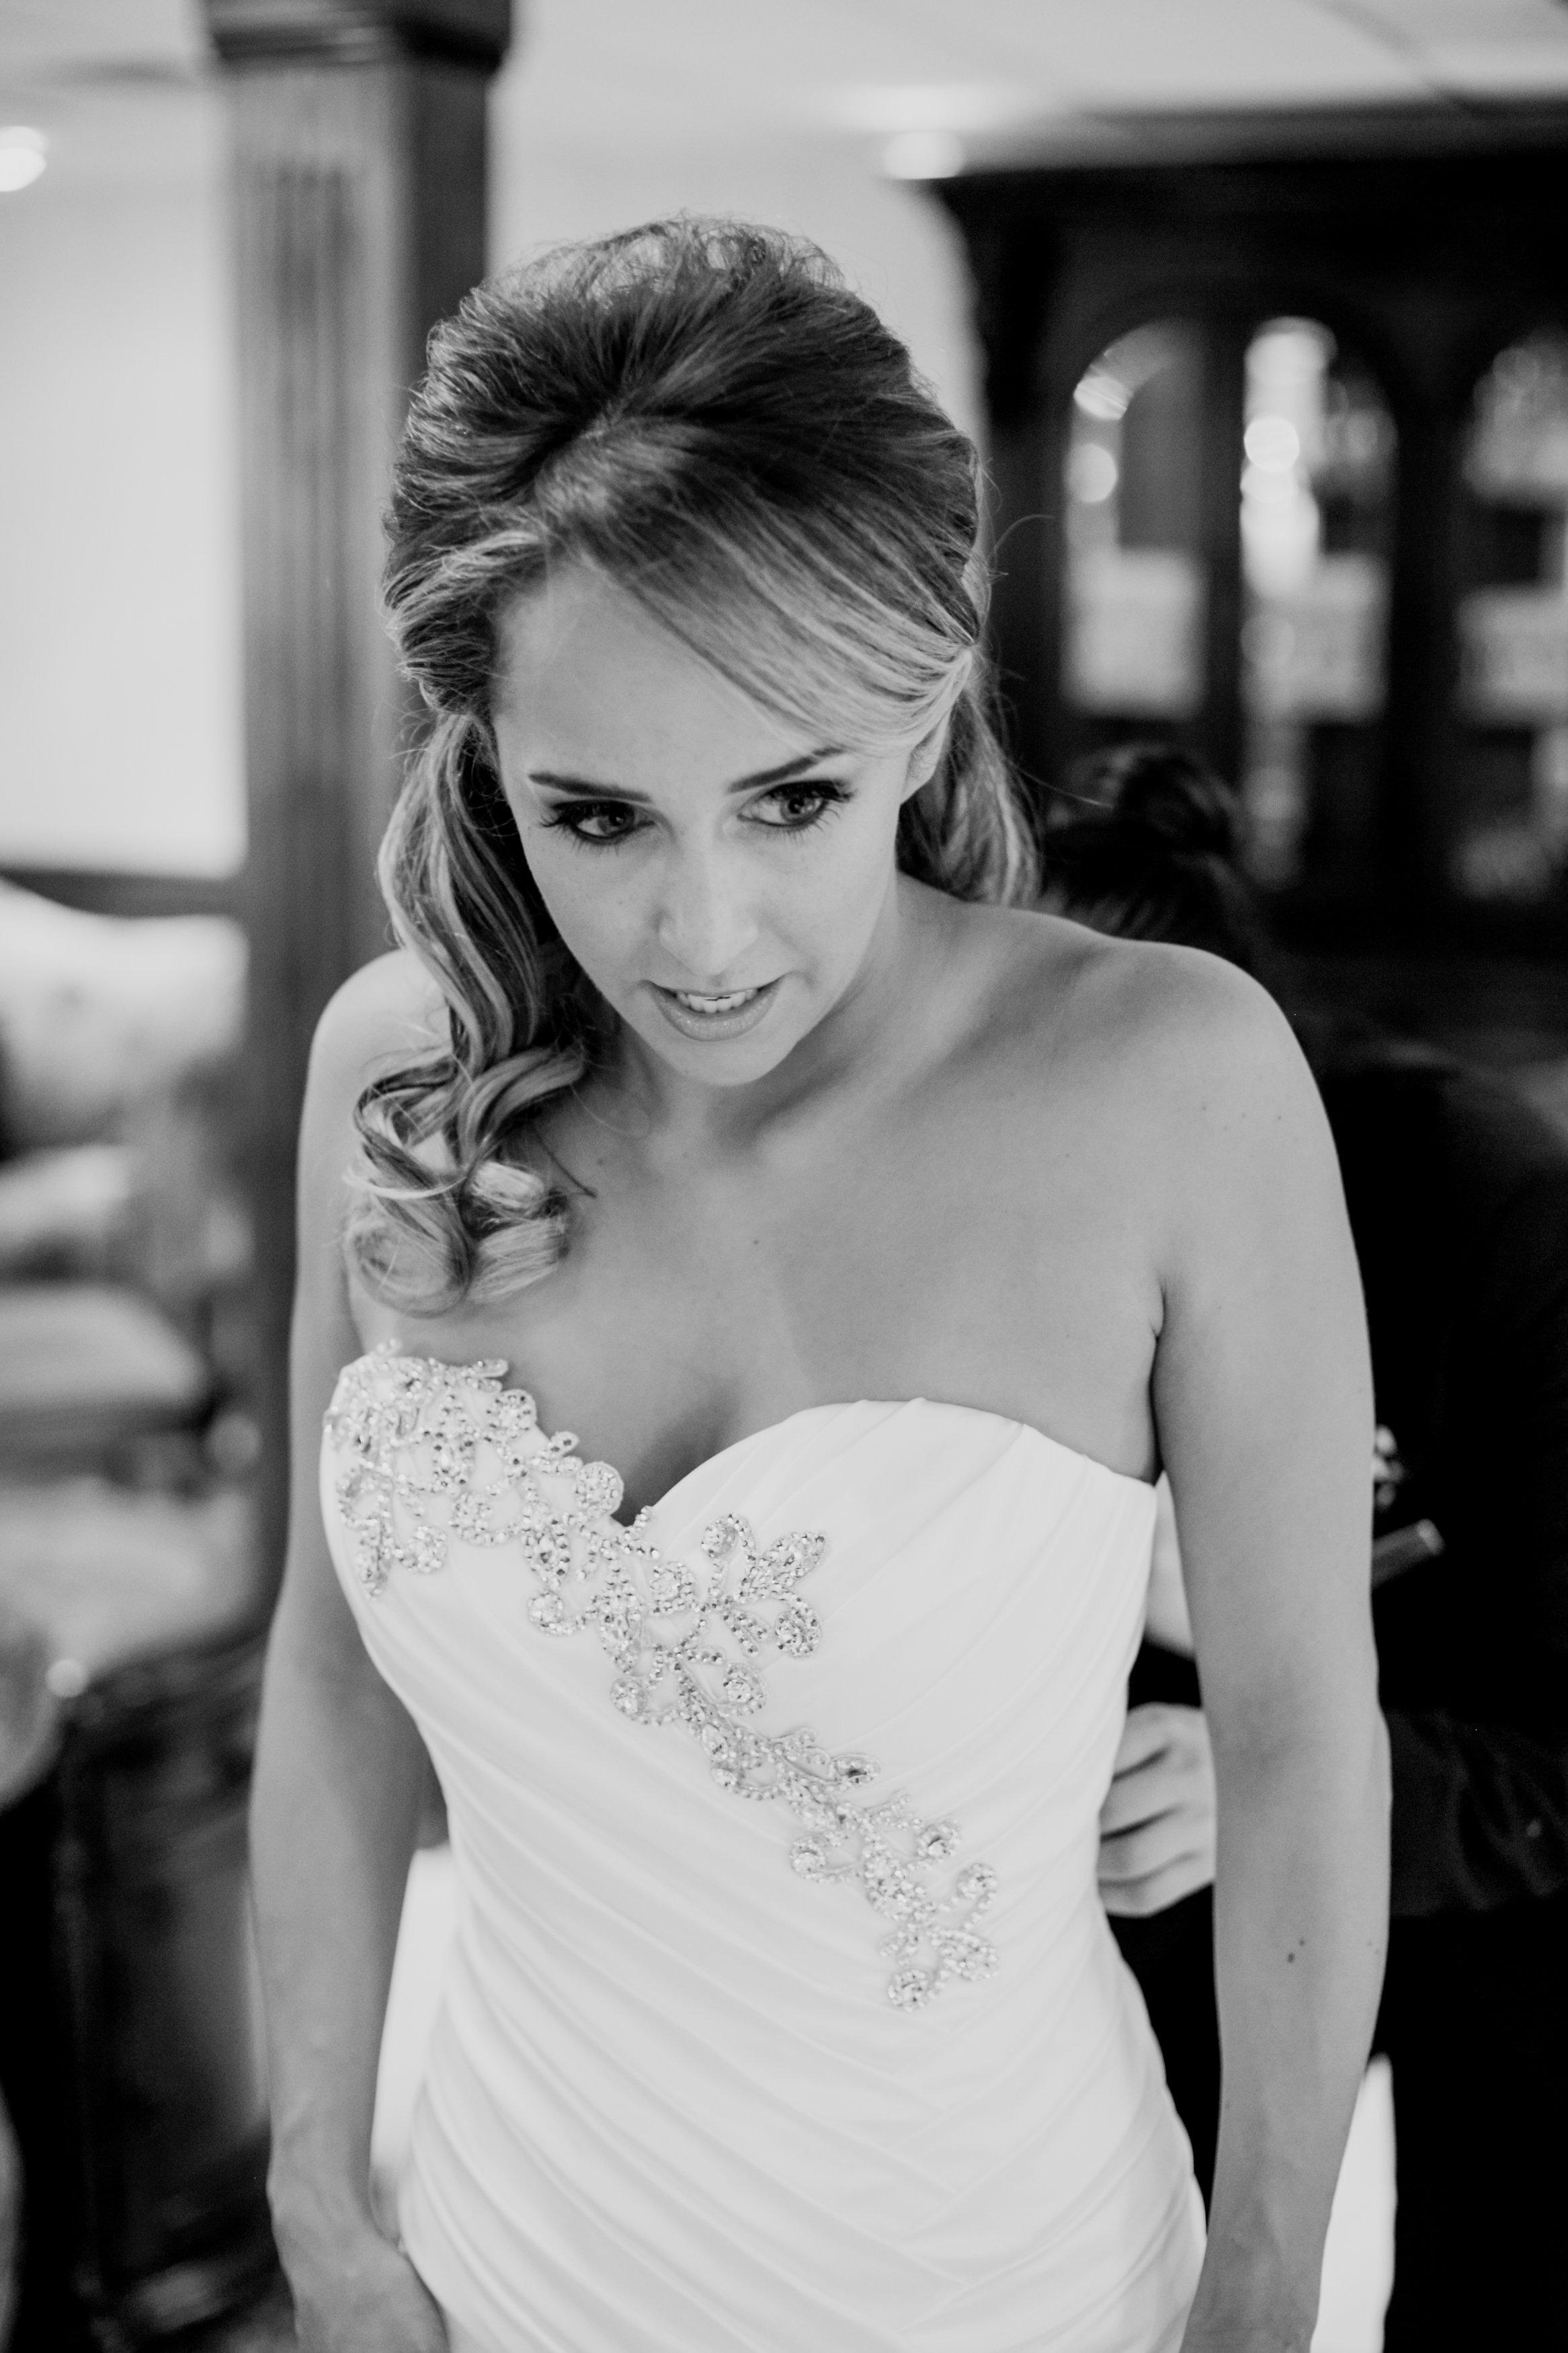 Ceci_New_York_Custom_Invitation_ New_Jersey_Wedding_Luxury_Personalized_Ceci_Style_Bride_Foil_Stamping12.jpg